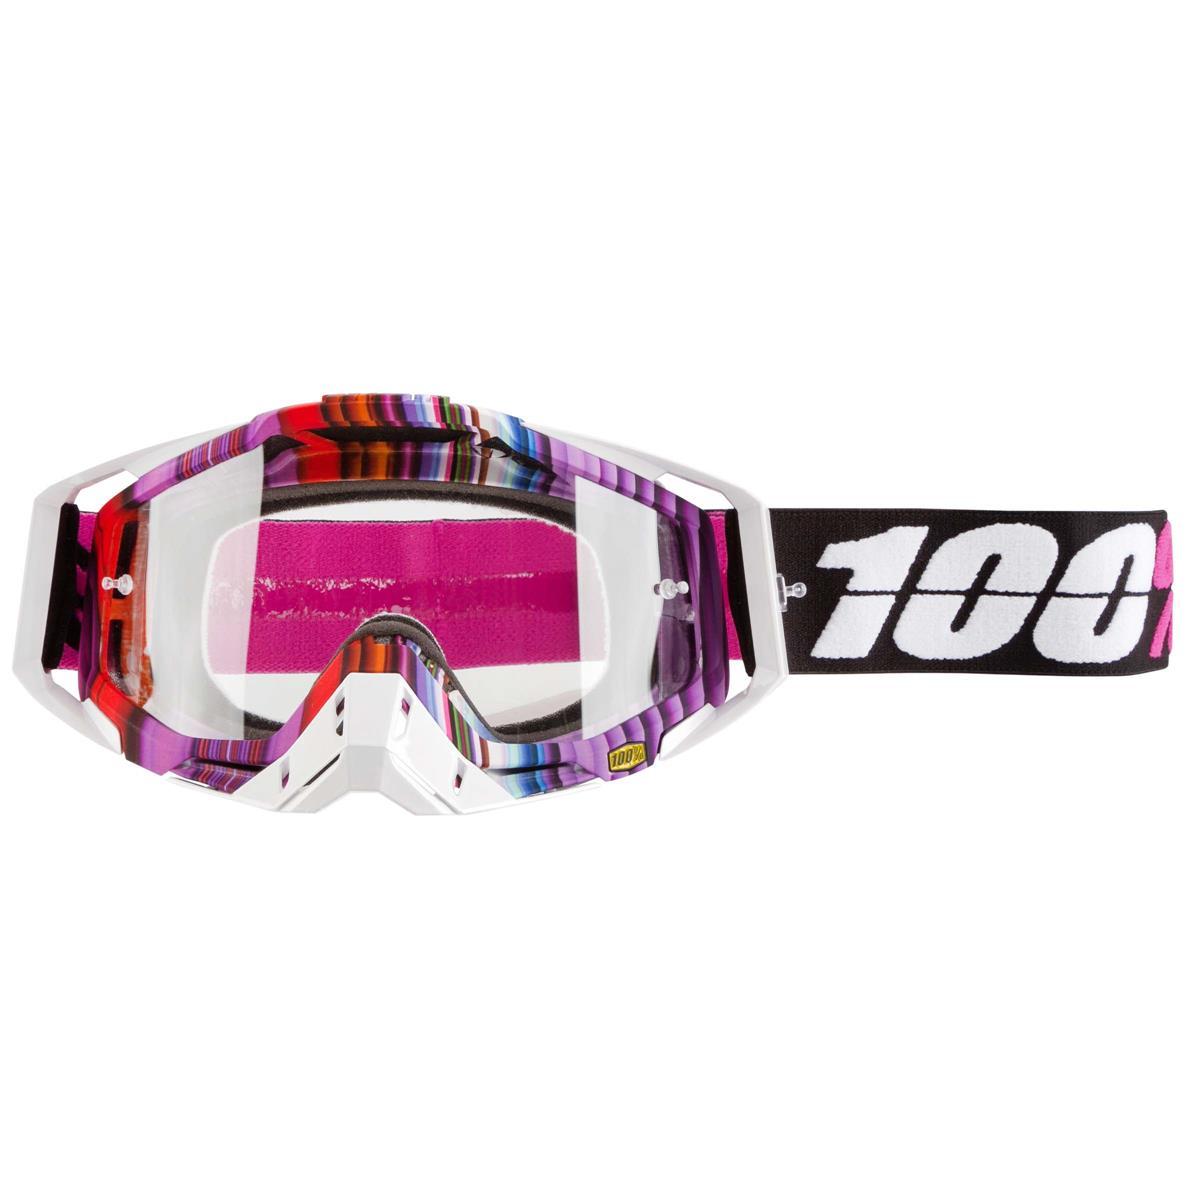 100% Crossbrille The Racecraft Glitch - Klar Anti-Fog